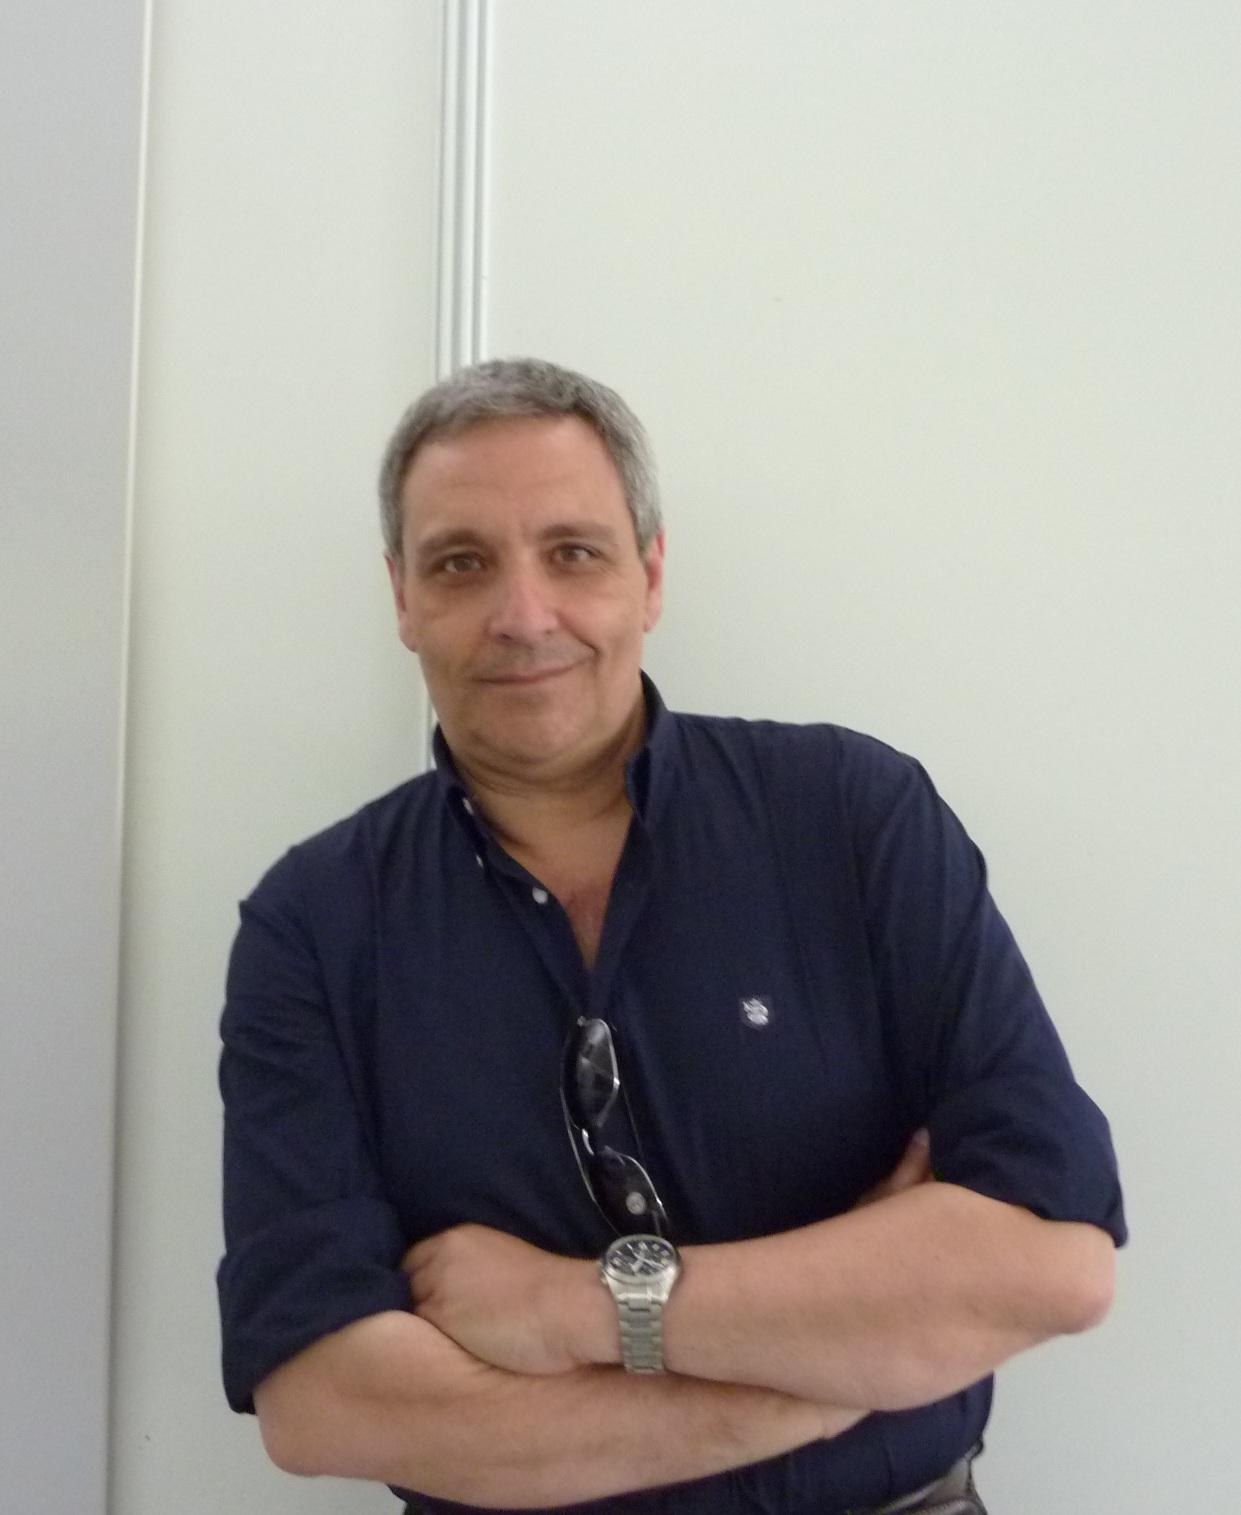 Mis detectives favorit@s: Giuseppe Lojacono - Maurizio de